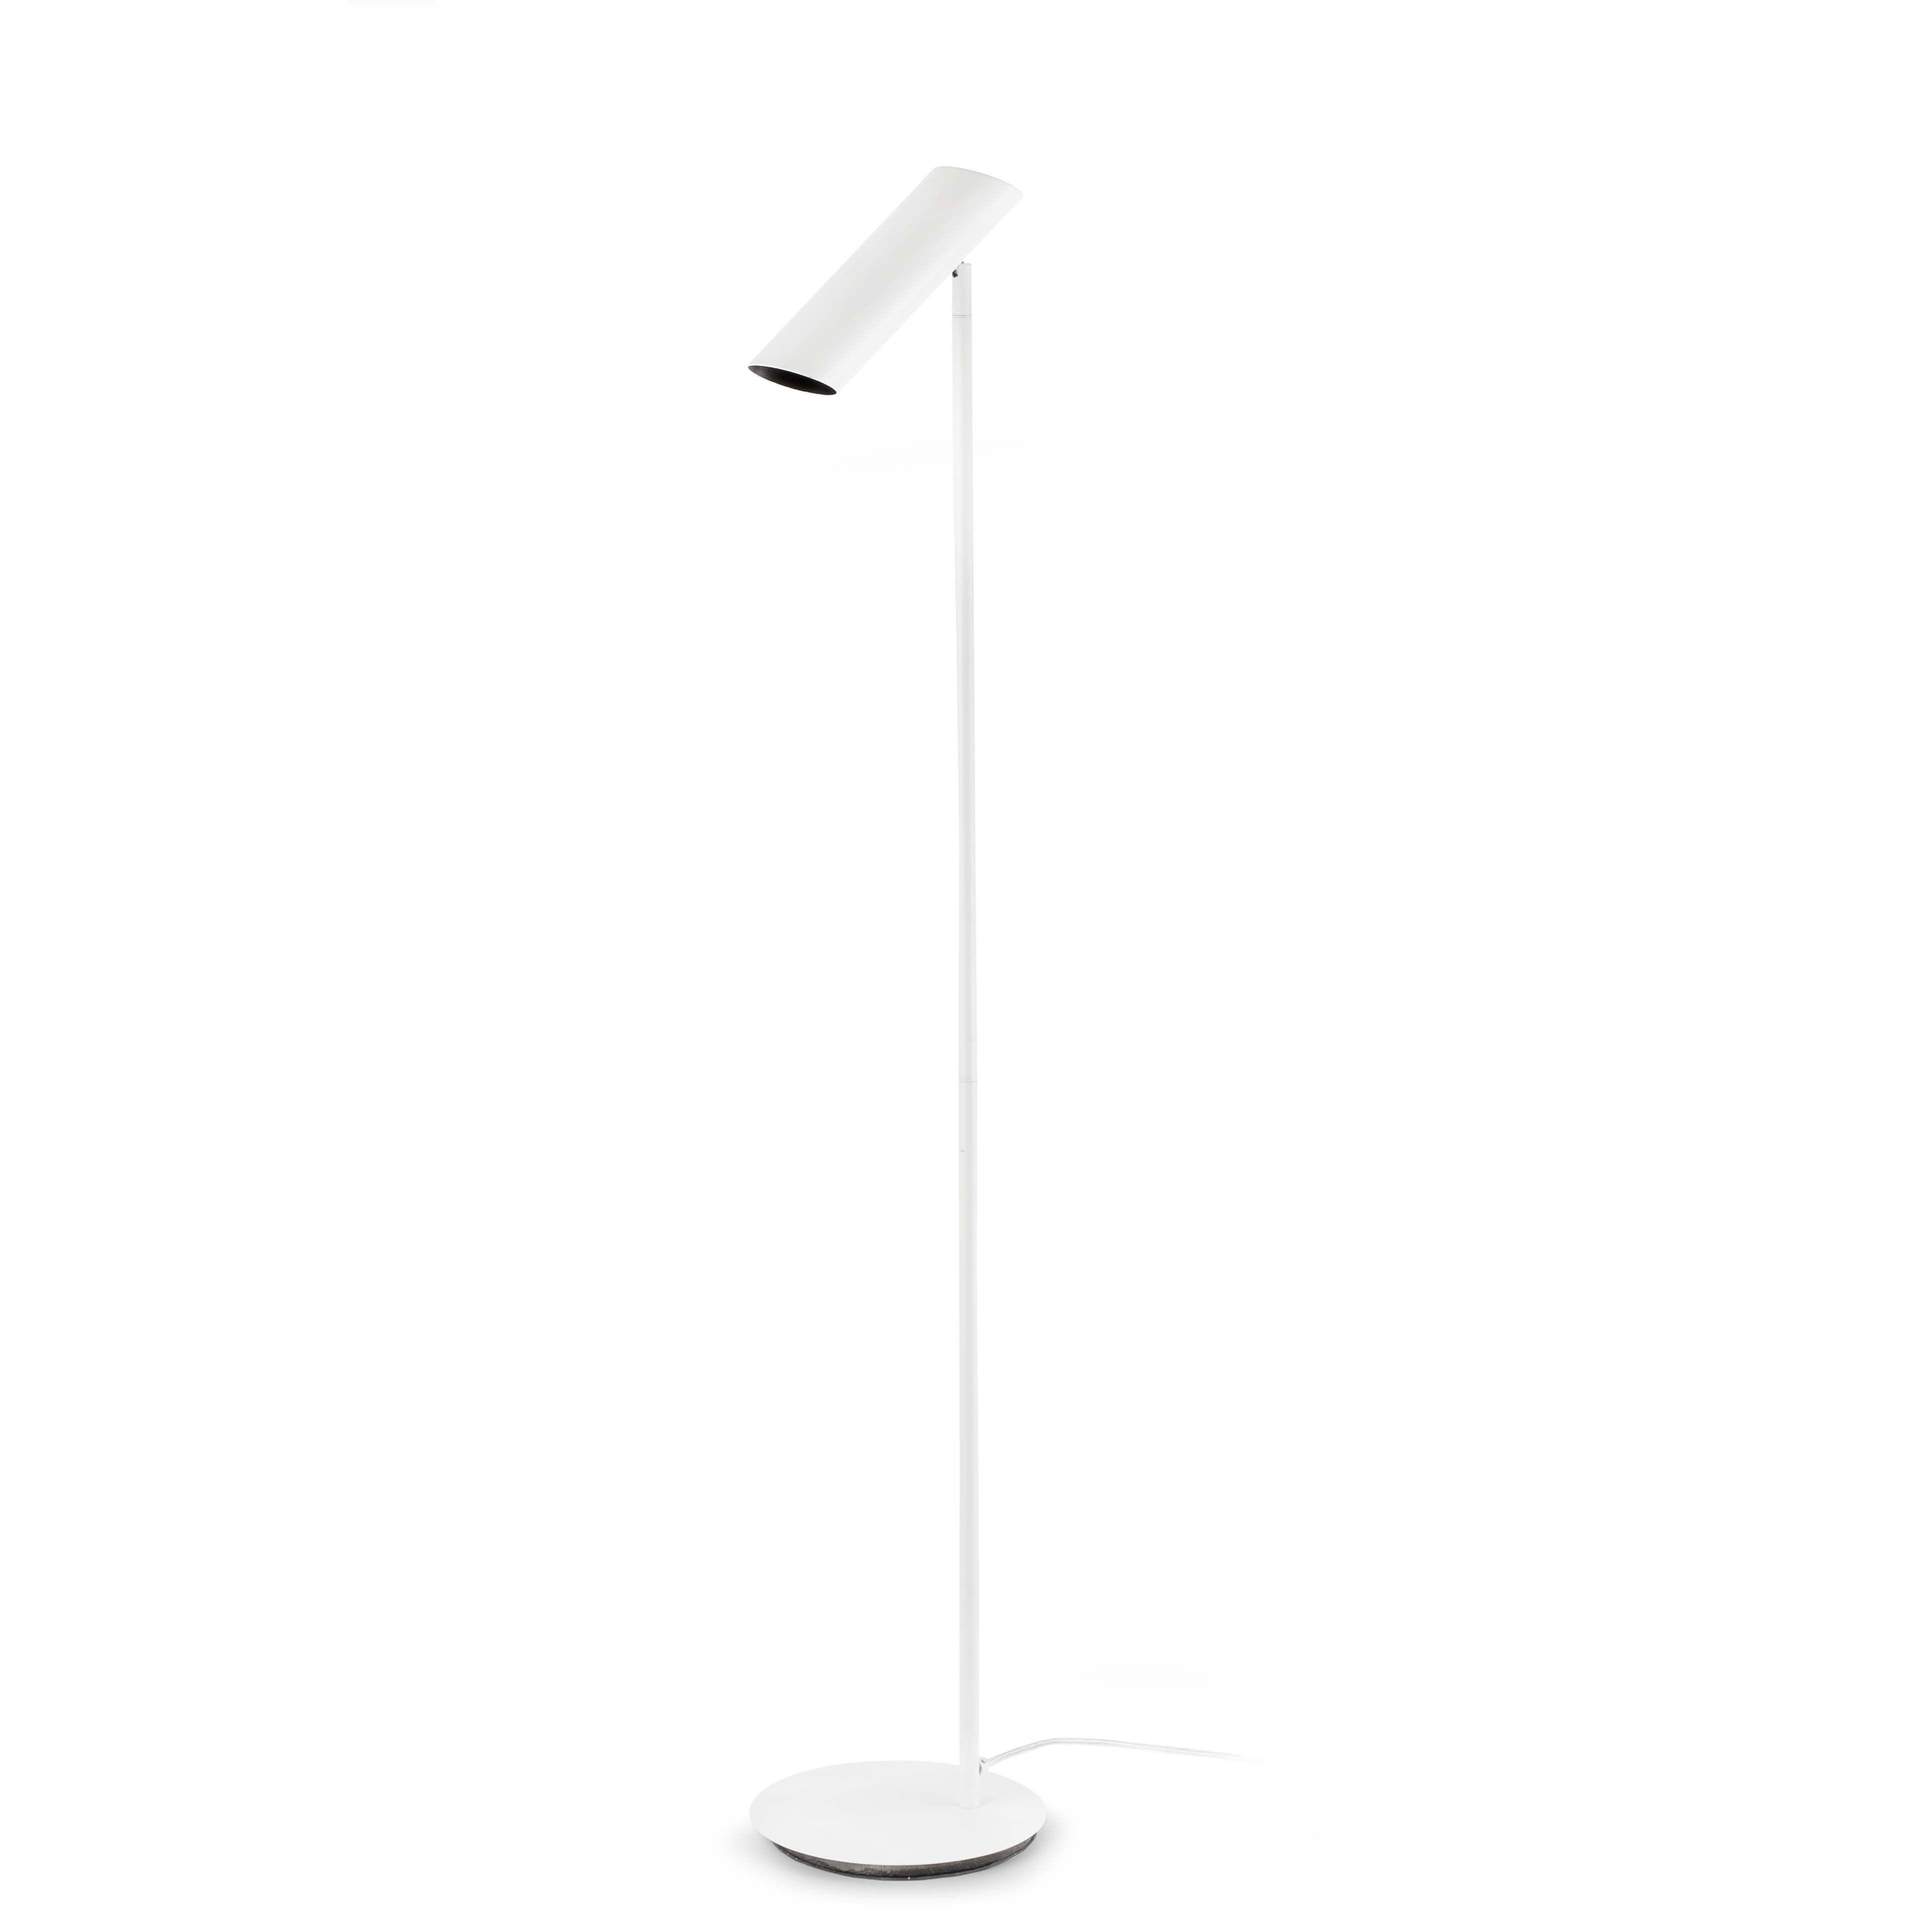 Lámpara lamp de de piediseñodesigned Pie LINKFloor D92YHIWE